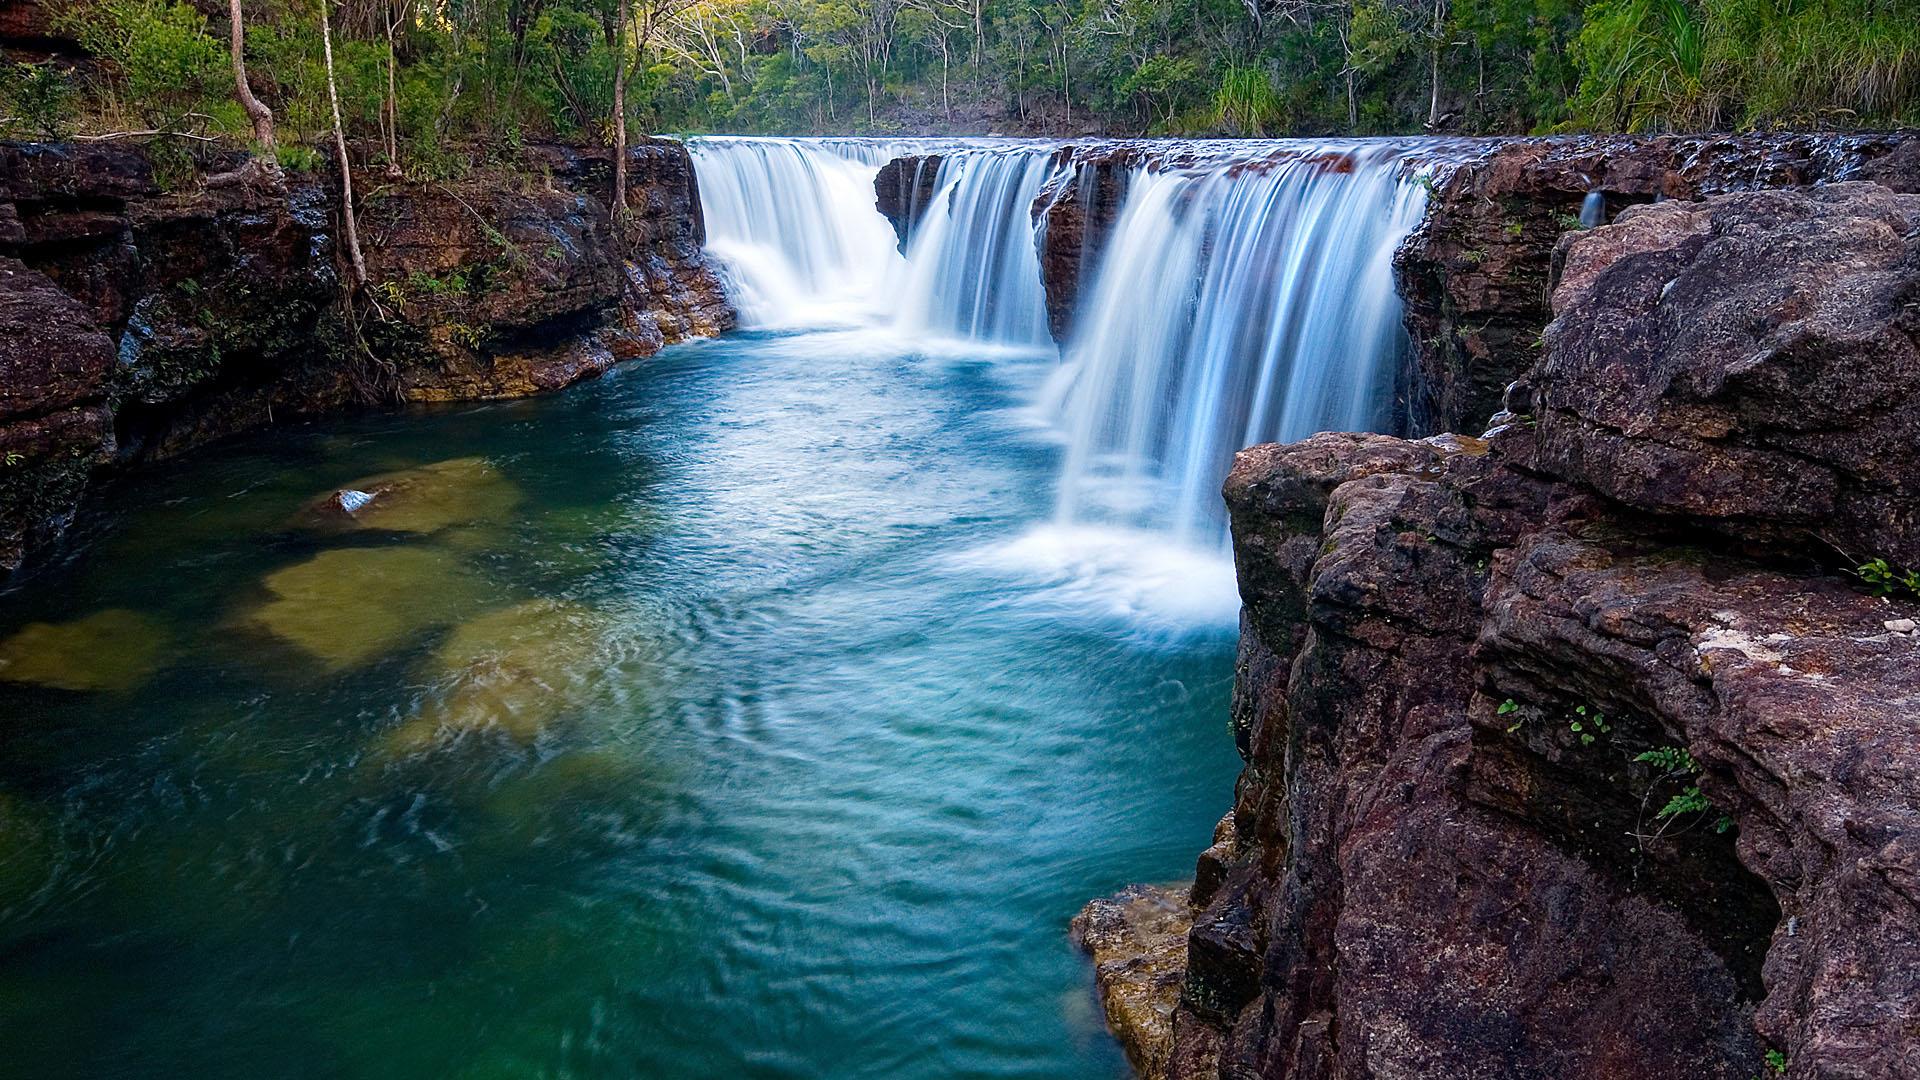 Waterfall Wallpaper HD